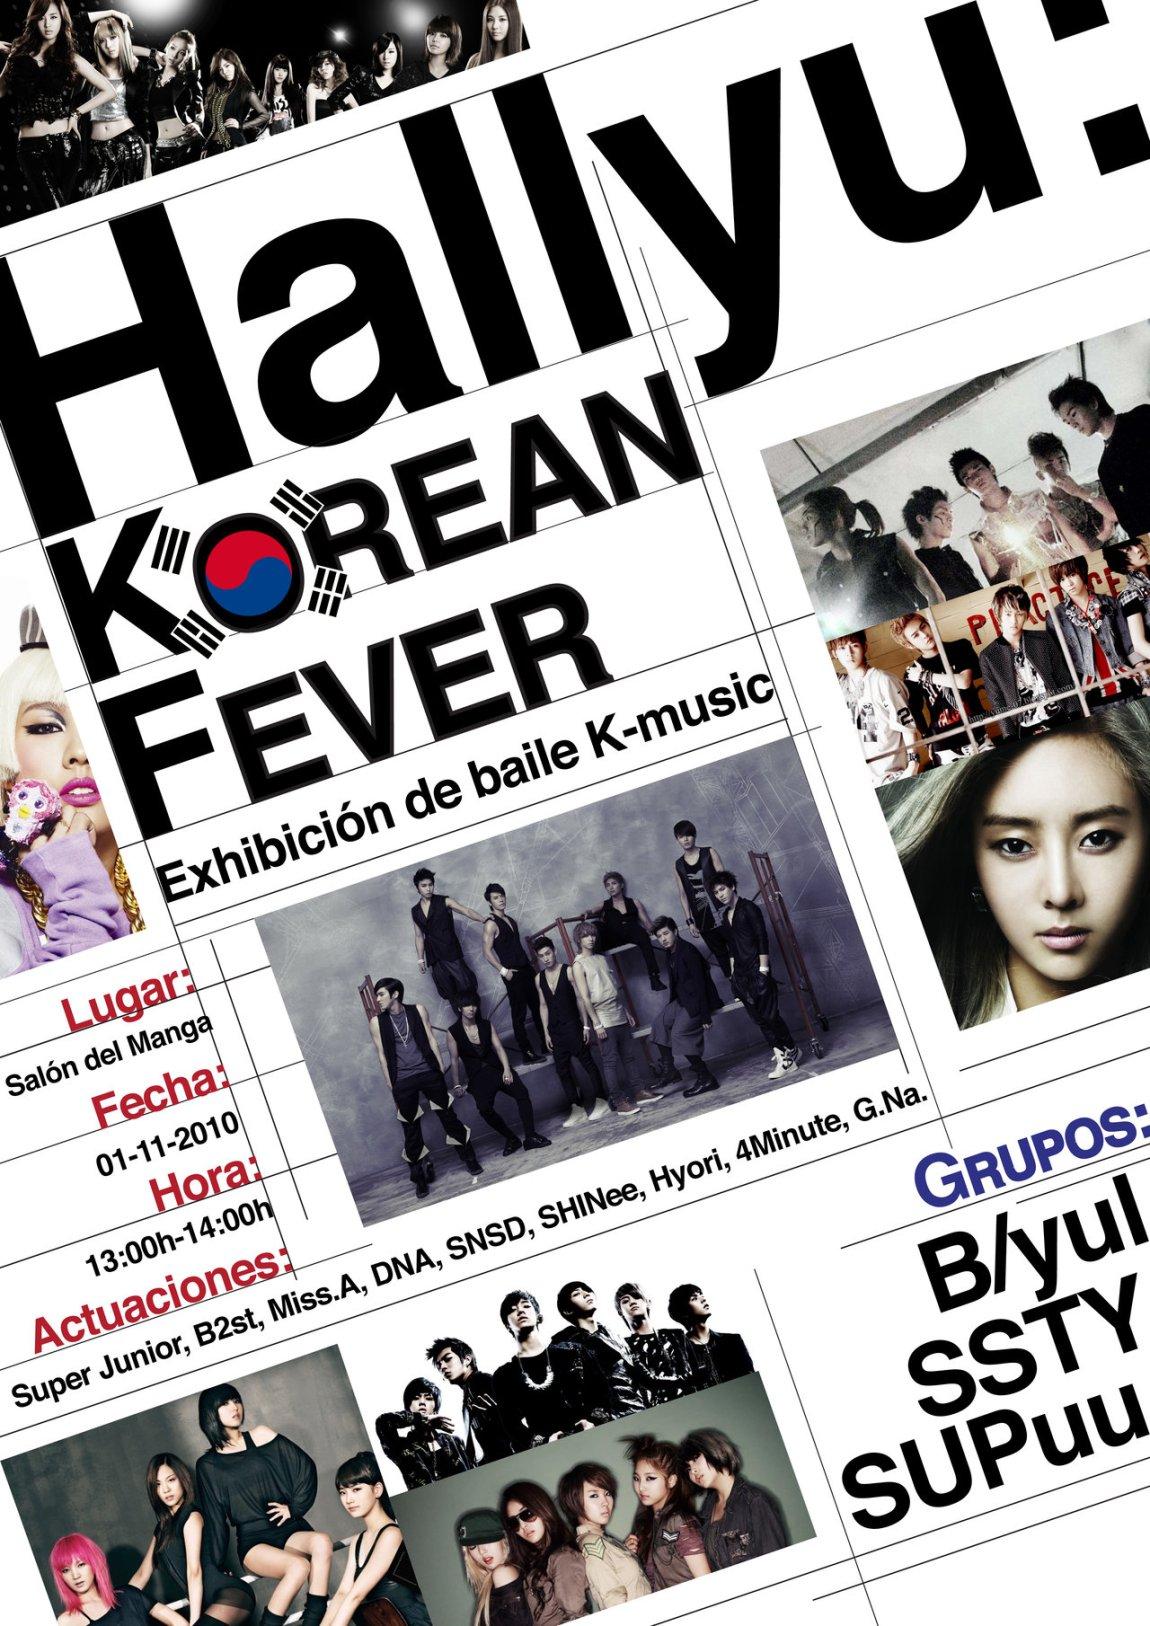 Upgrade 'hallyu' beyond KPOP, K-Drama